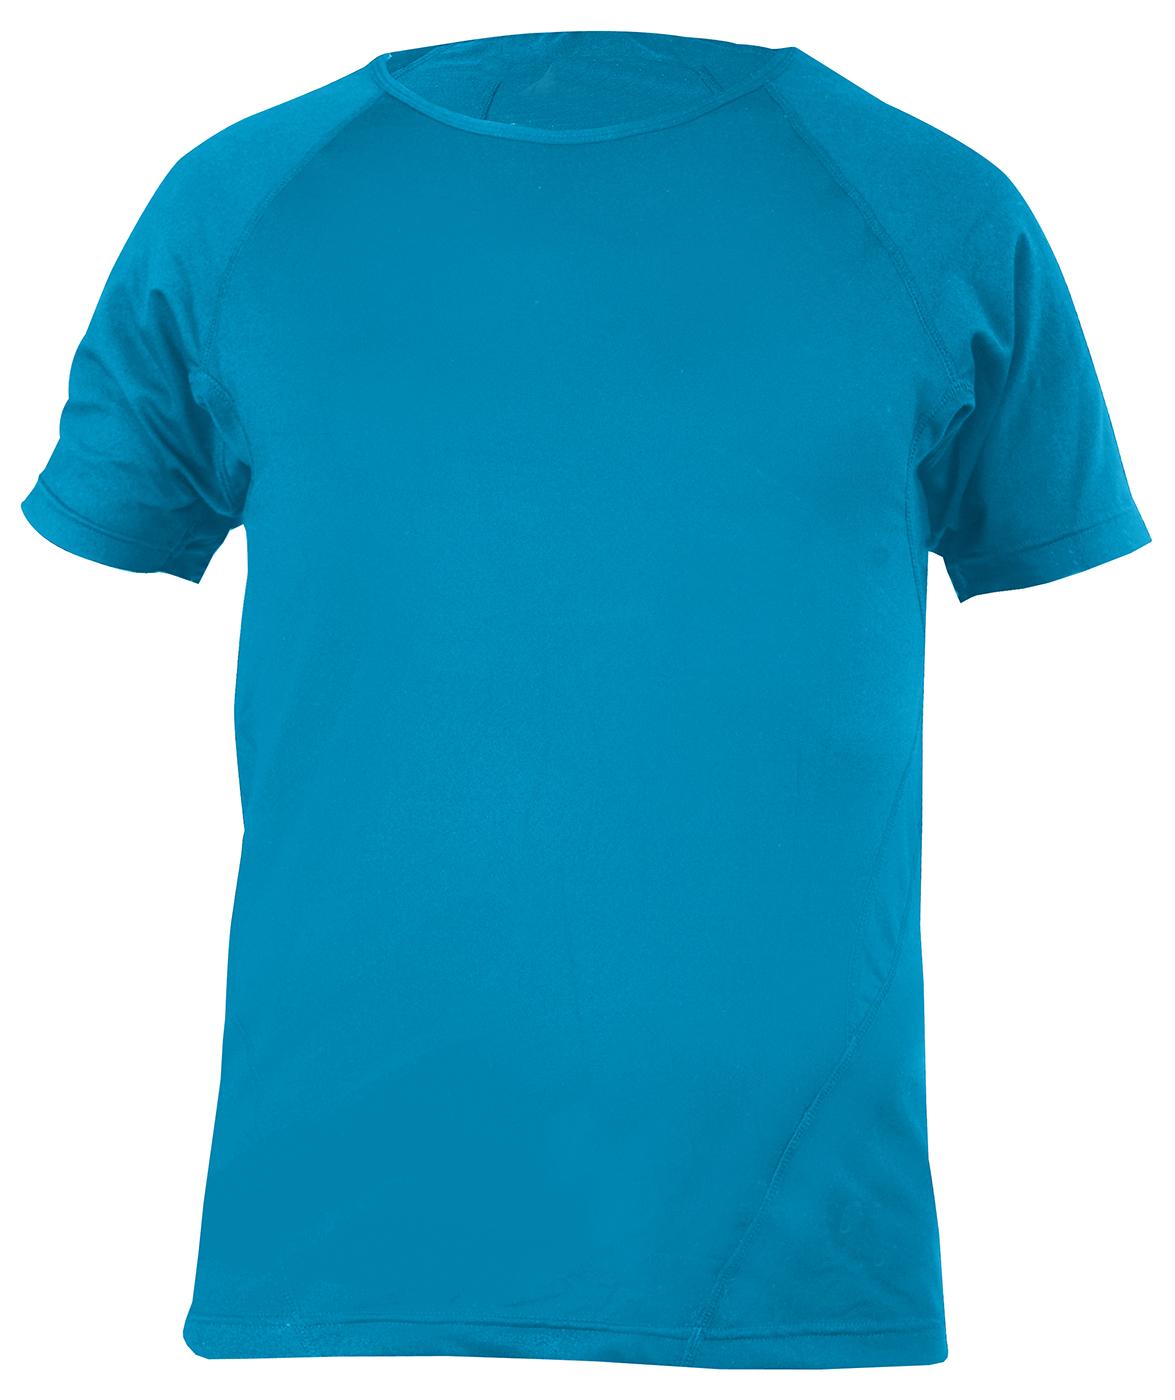 Yogi-T-Shirt, men - aqua